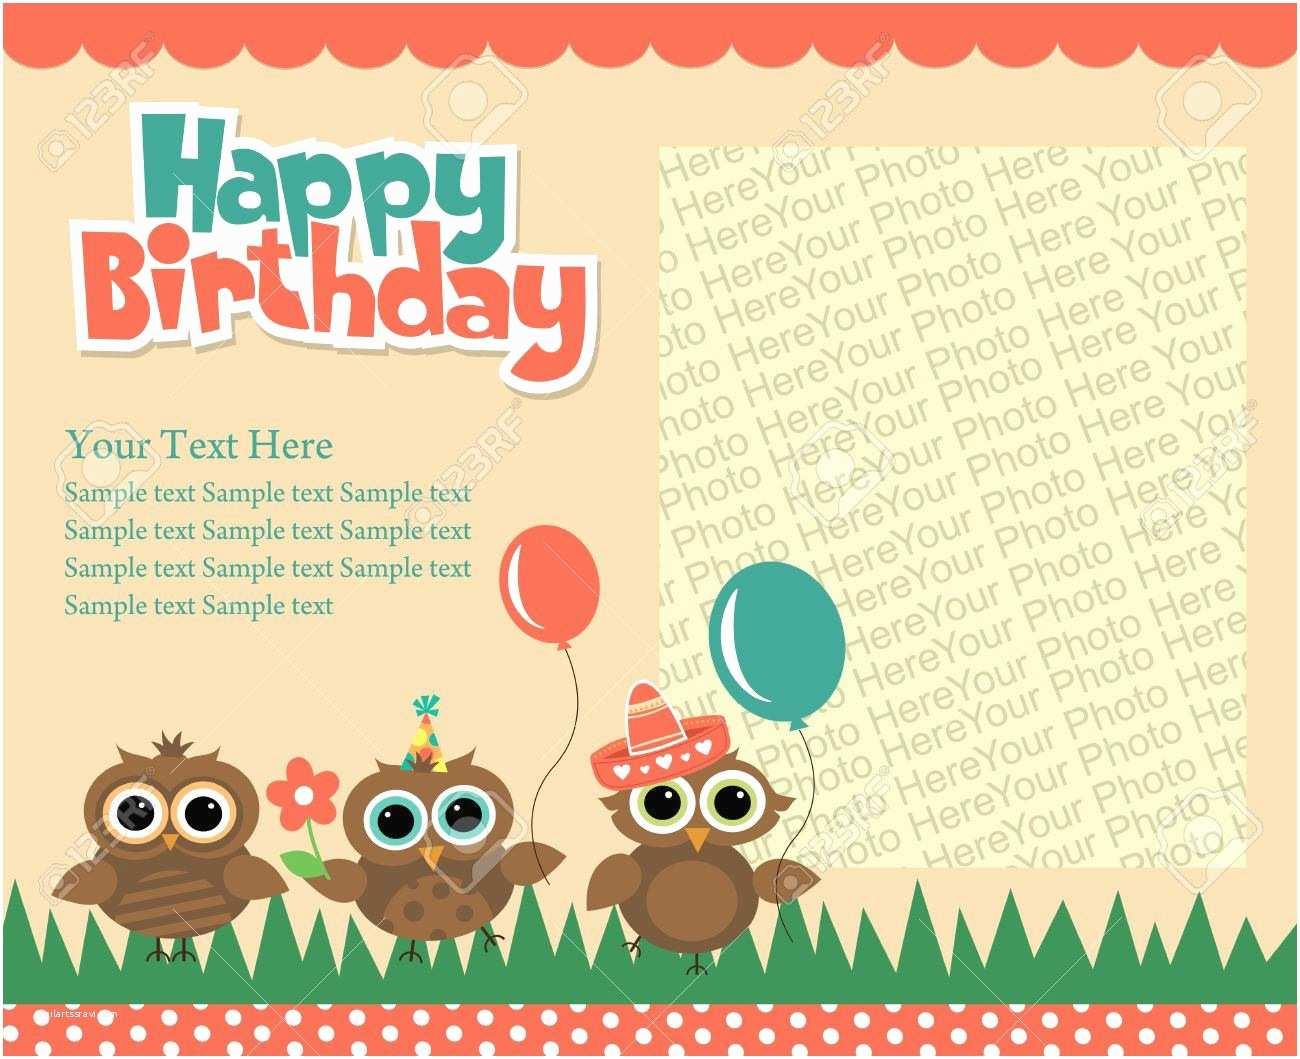 Birthday Party Invitation Card Invitation Card Happy Birthday Image Collections